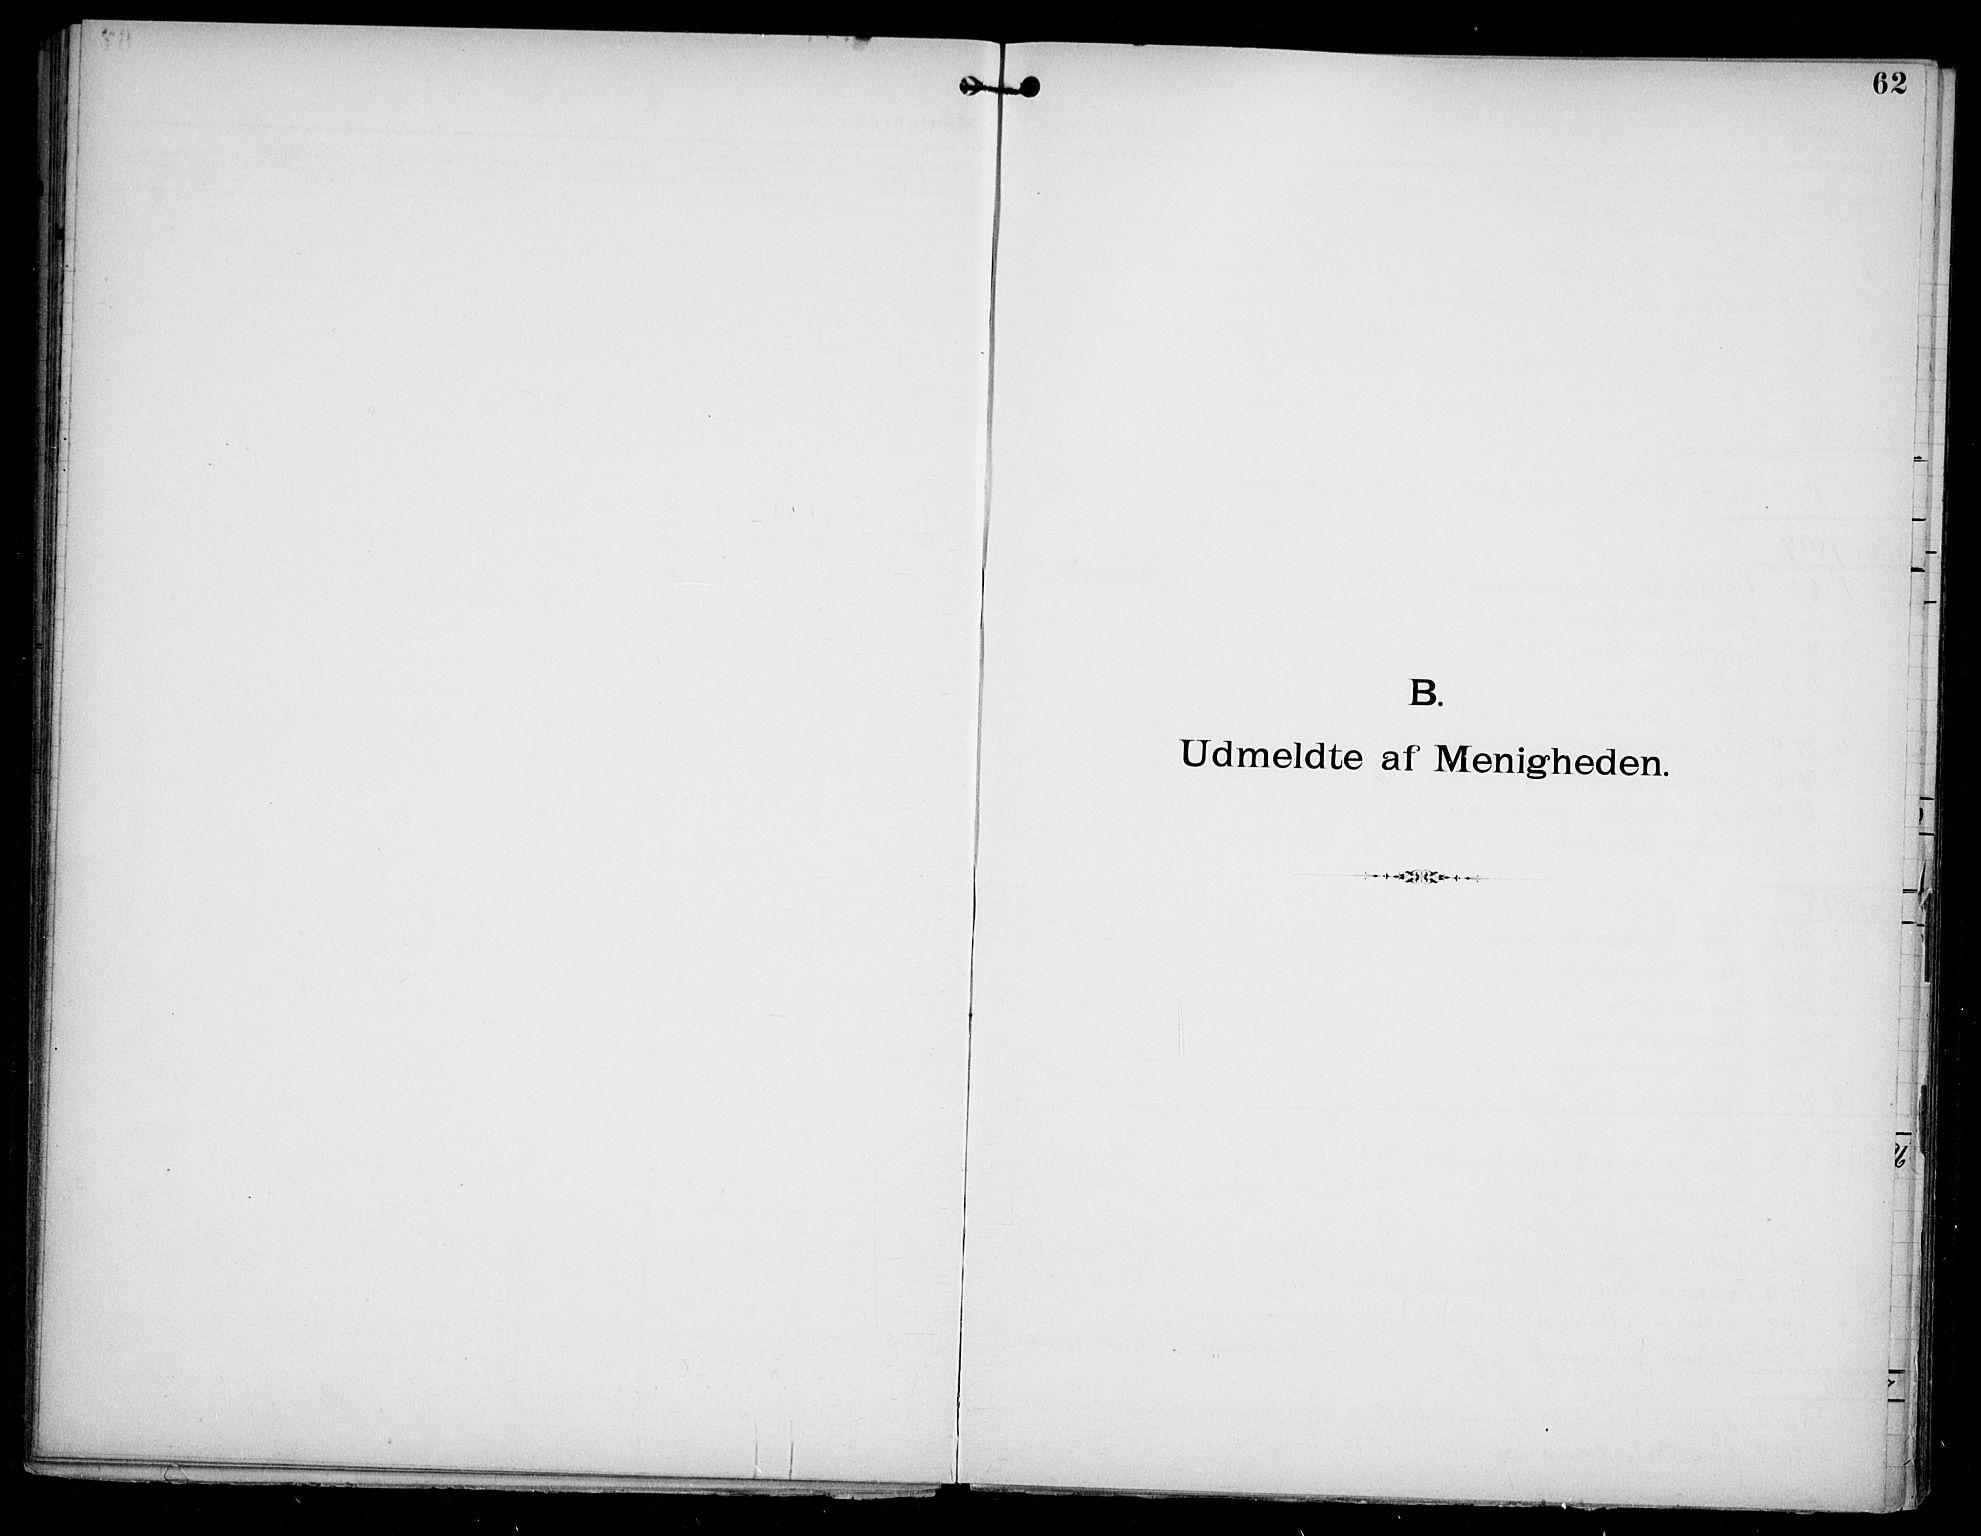 SAO, Den katolsk apostoliske menighet i Oslo , F/Fa/L0002: Dissenterprotokoll nr. 2, 1892-1937, s. 62